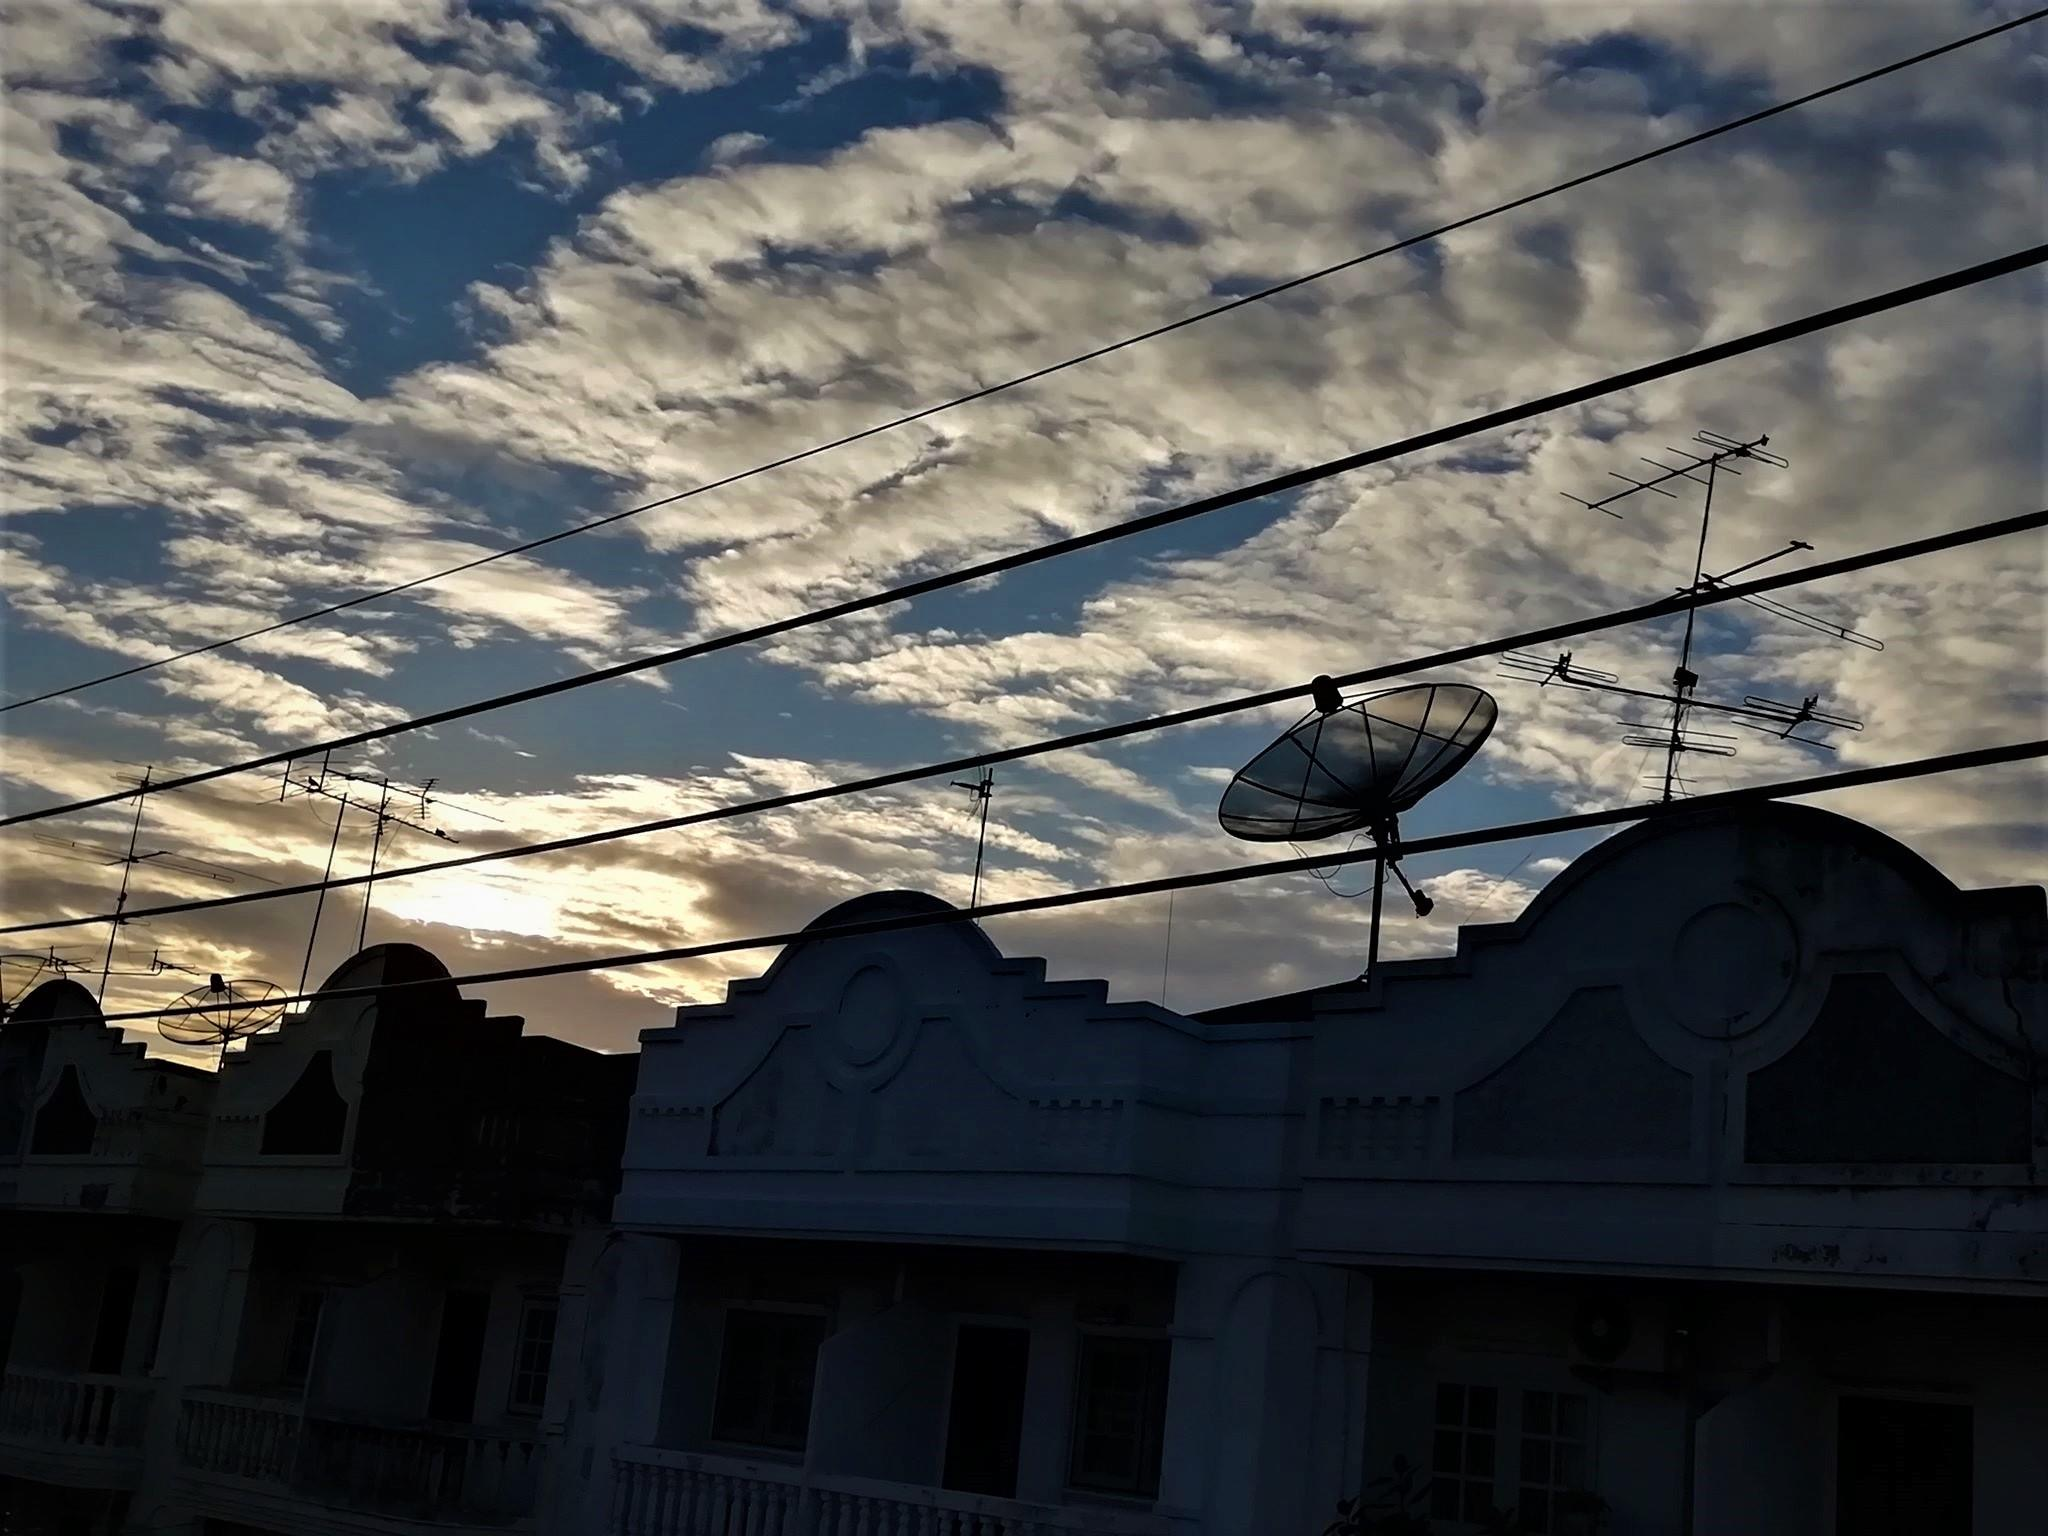 SUNSET ON TOWNHOUSES ⛅️🌥🌇🌆 ( พระอาทิตย์ลับขอบตึกแถว ⛅️🌥🌇🌆 )